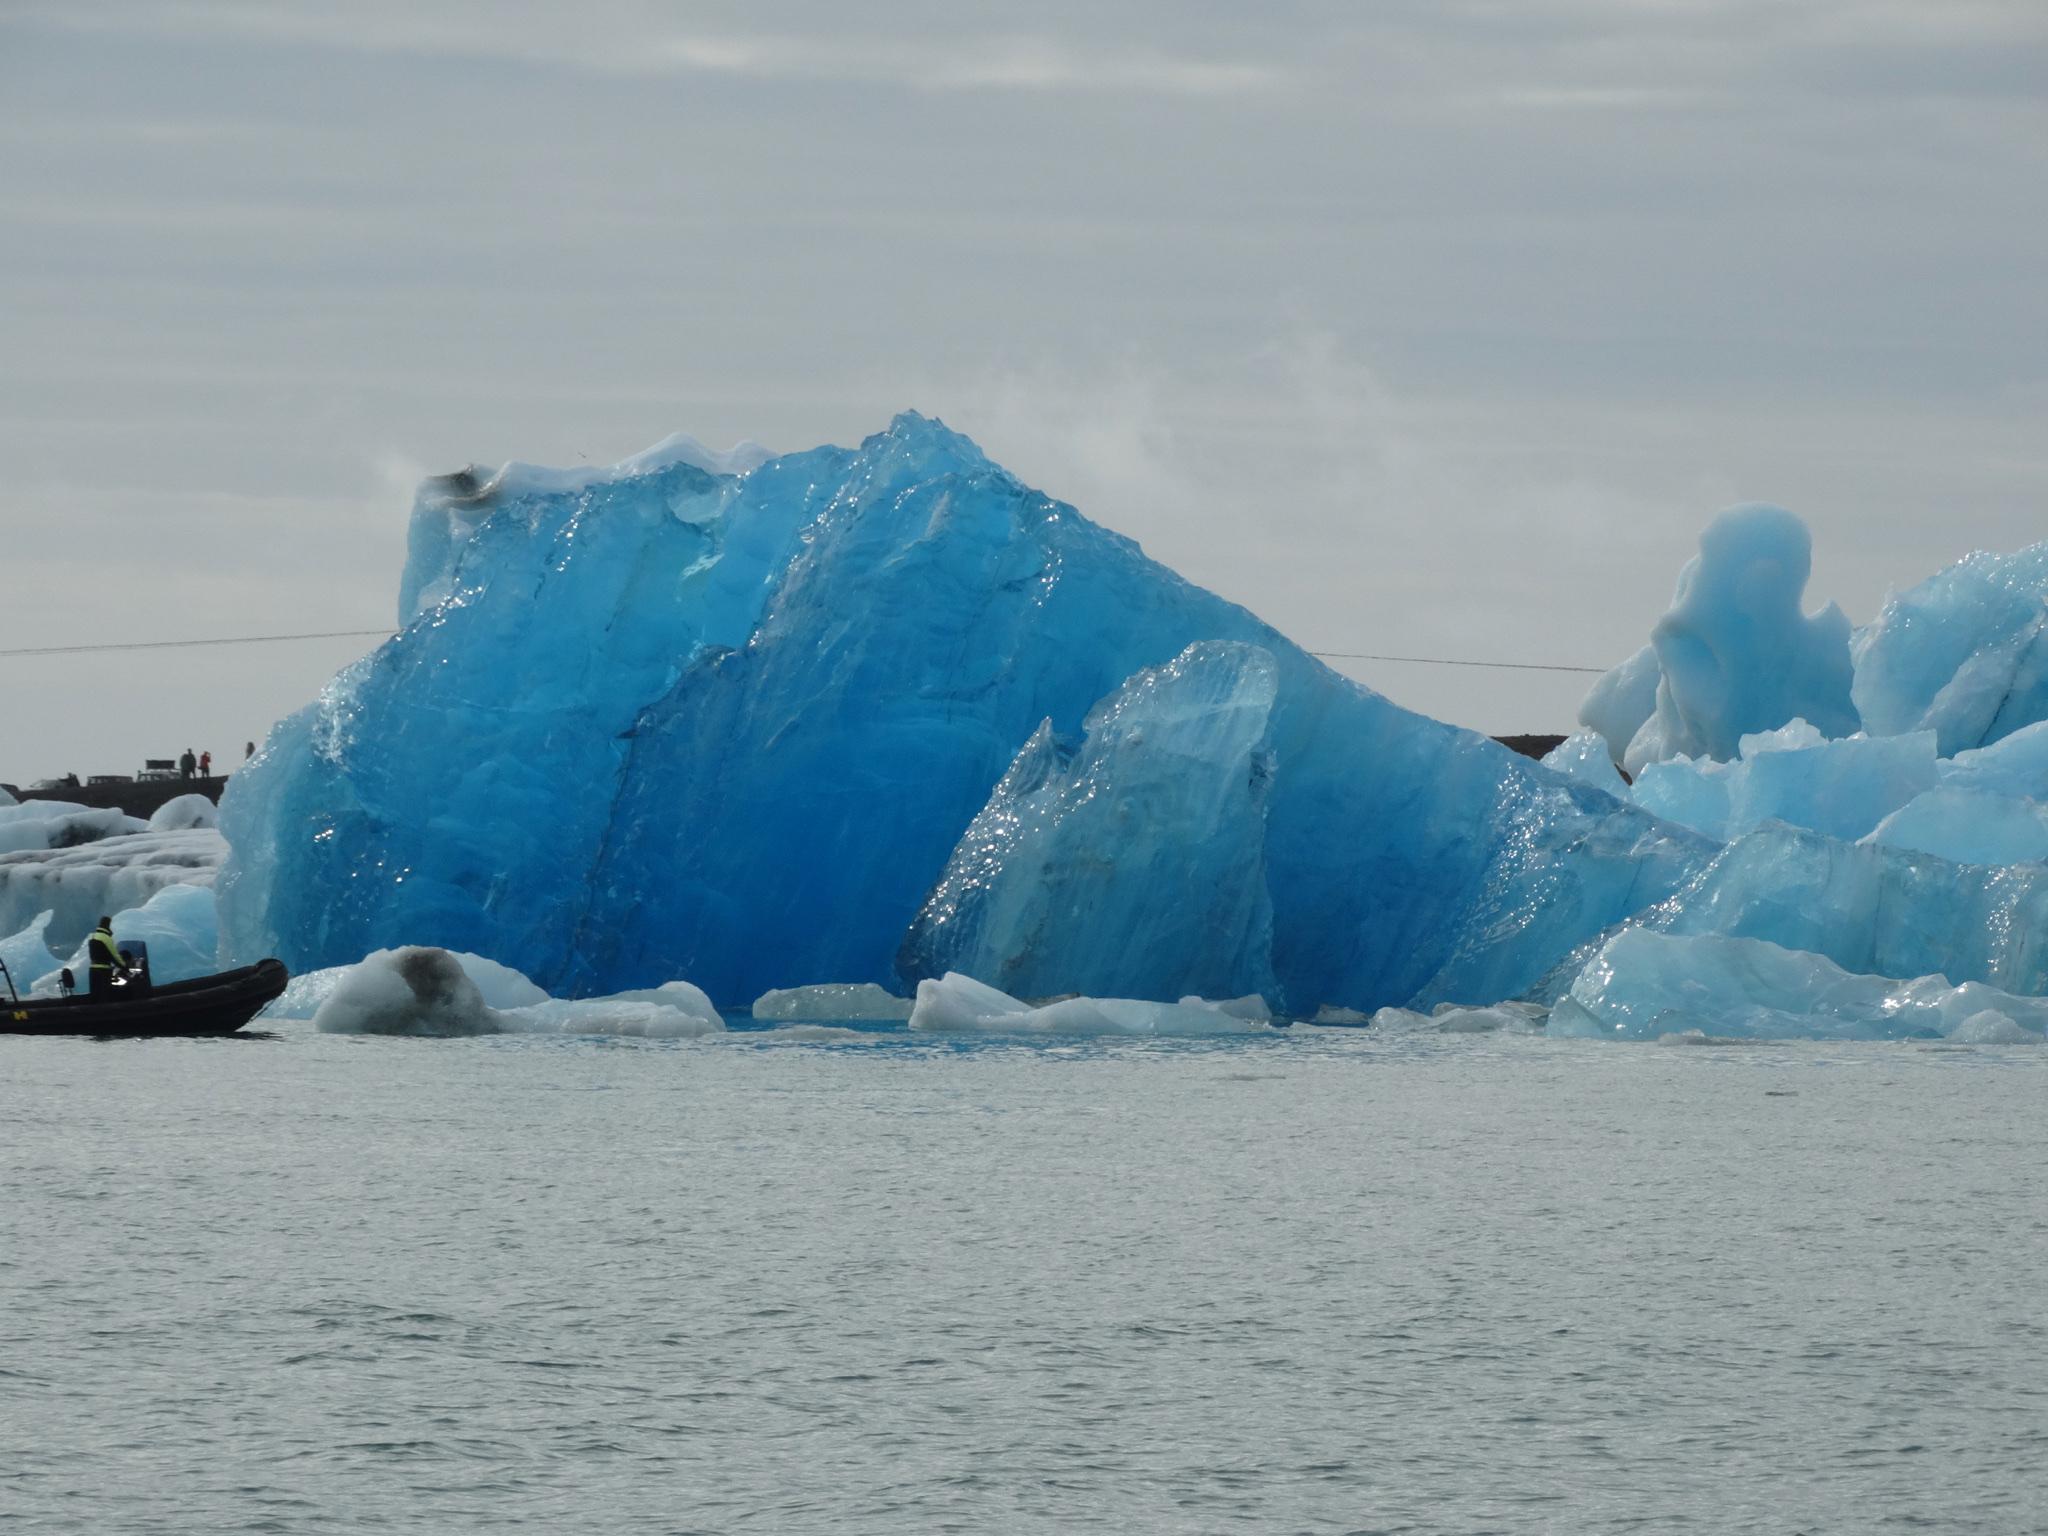 A Glacier in Iceland